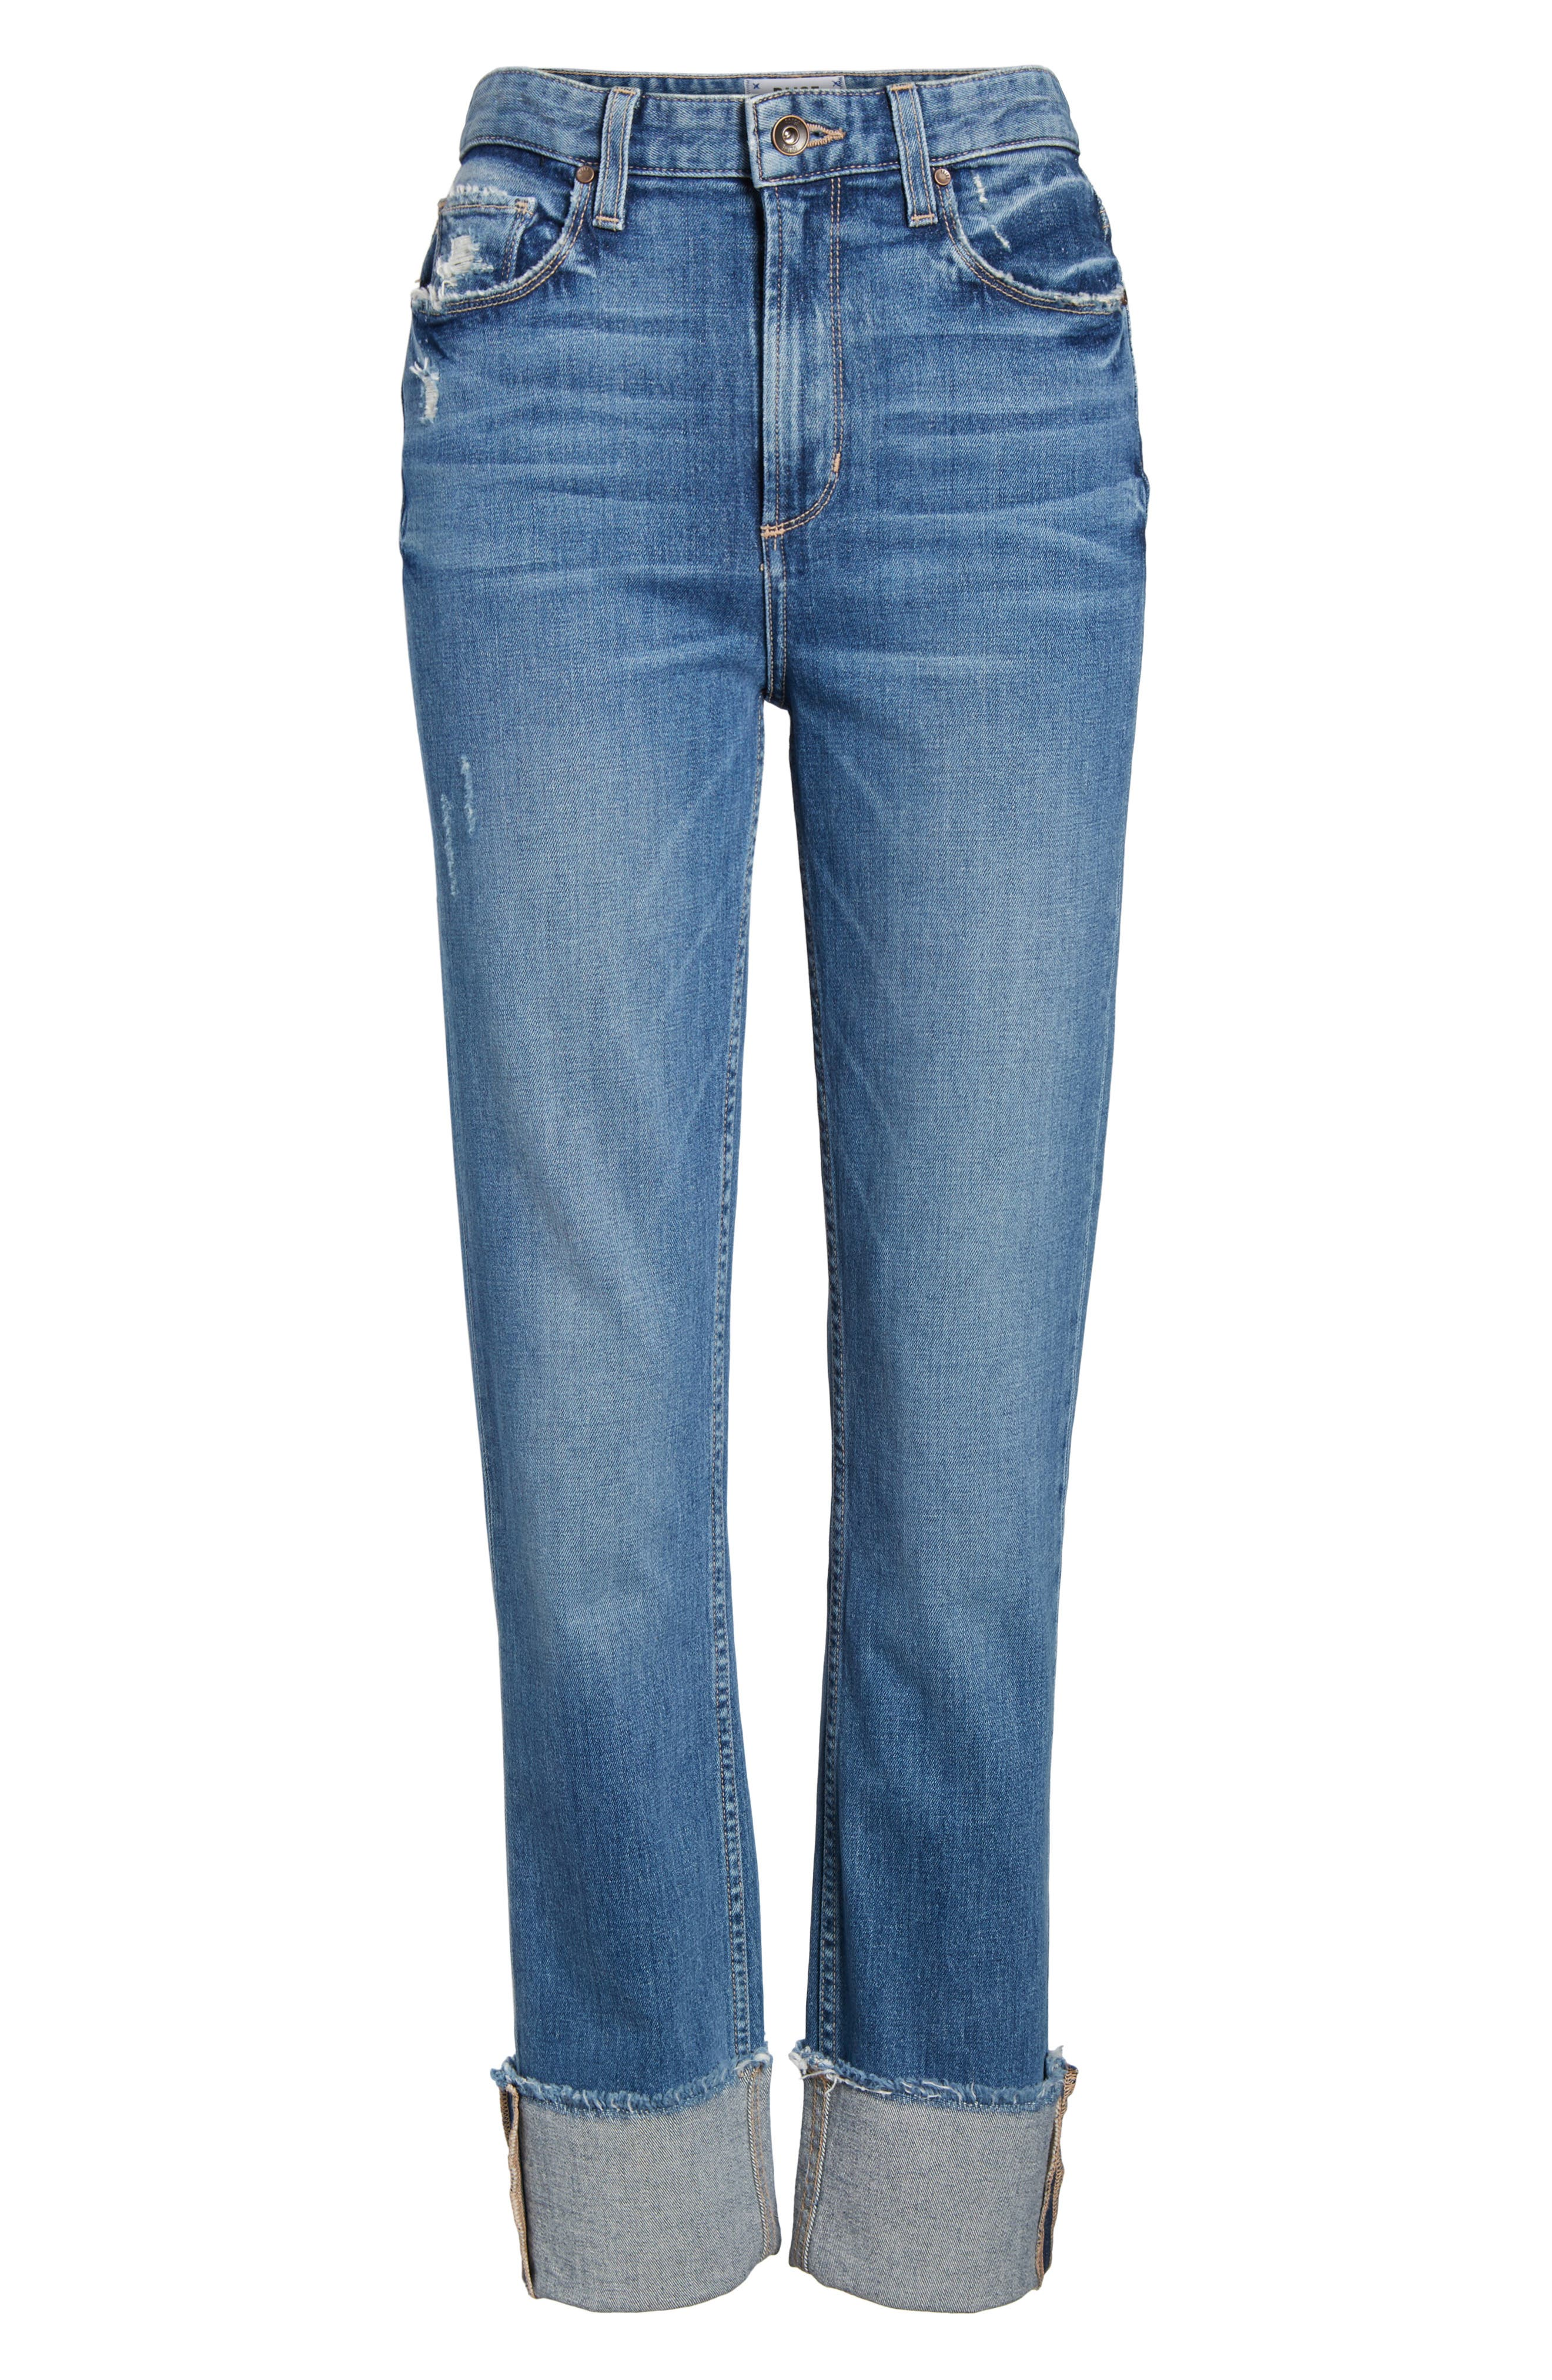 Sarah High Waist Straight Leg Jeans,                             Alternate thumbnail 7, color,                             400